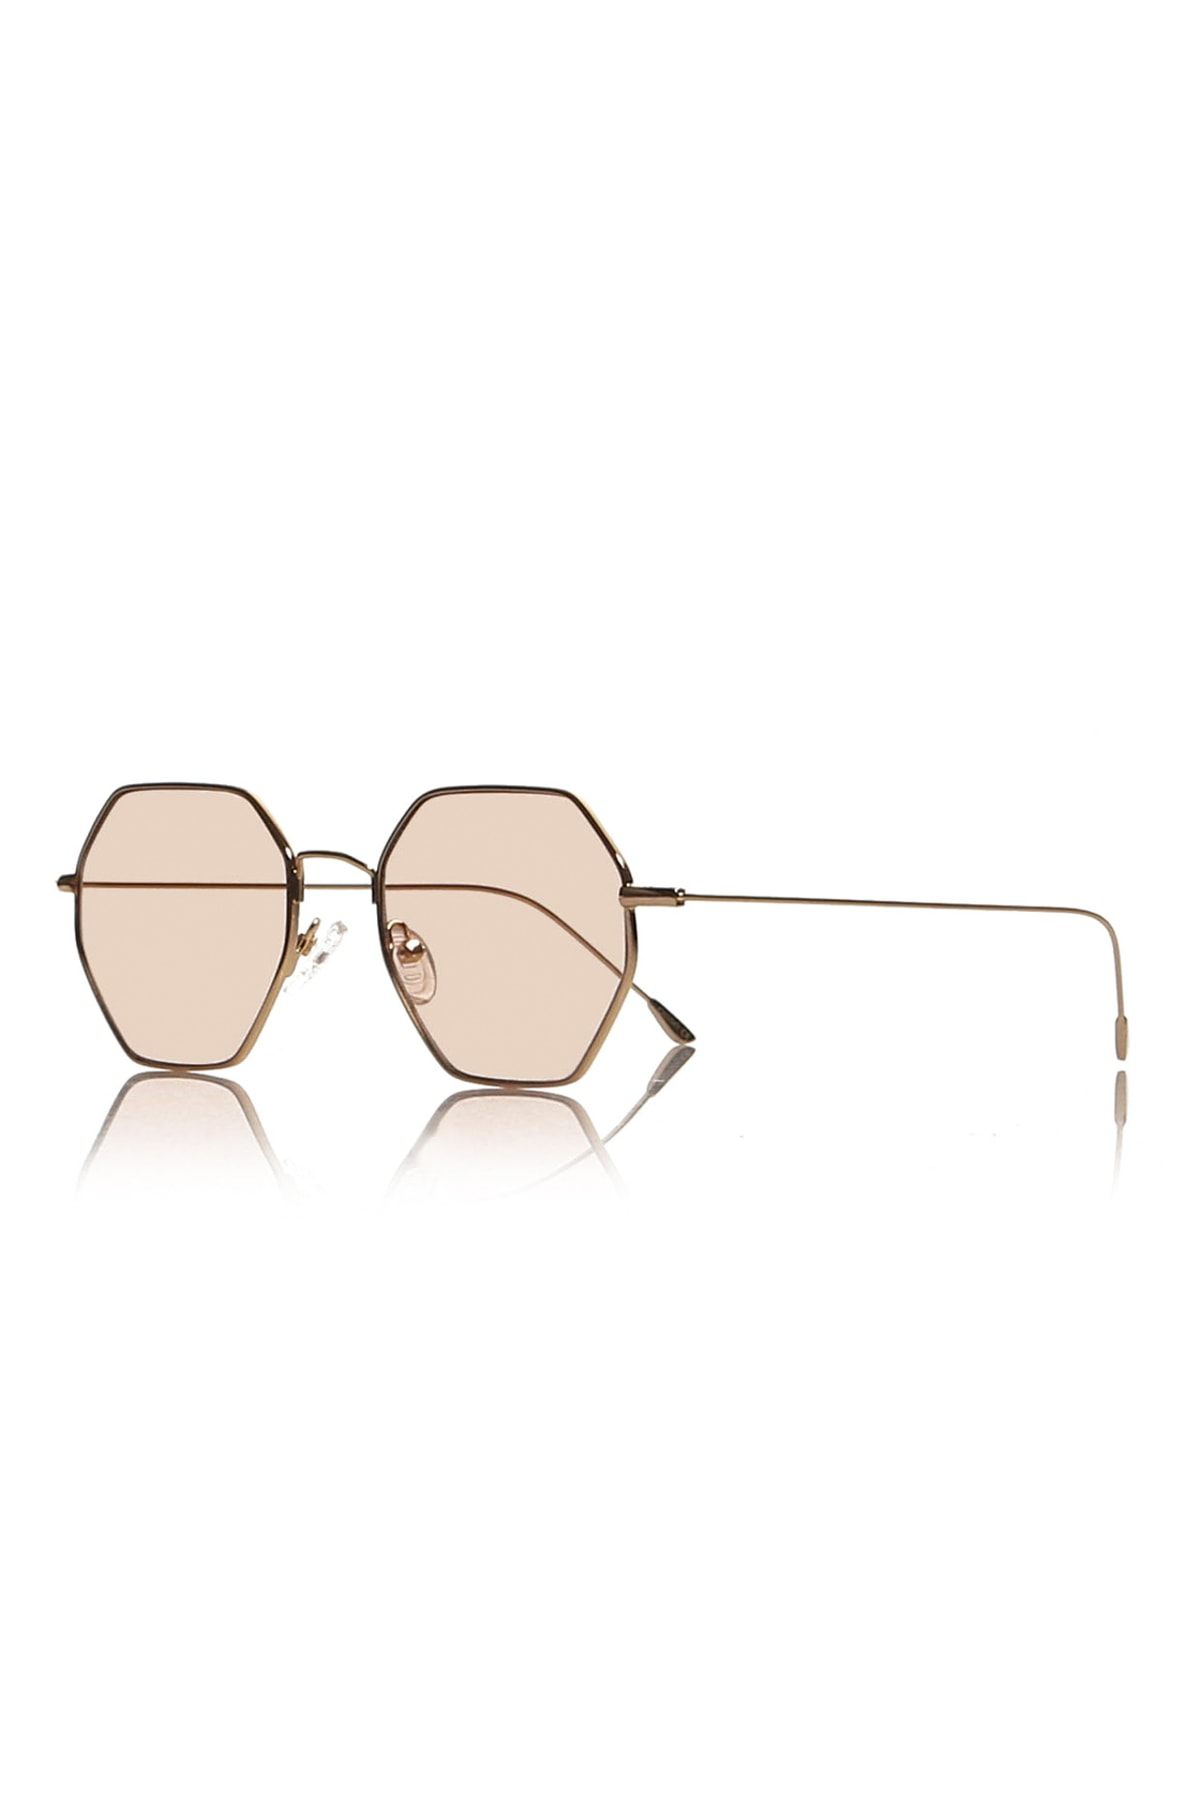 خرید مدل عینک آفتابی اسپرت برند Osse کد ty2725060